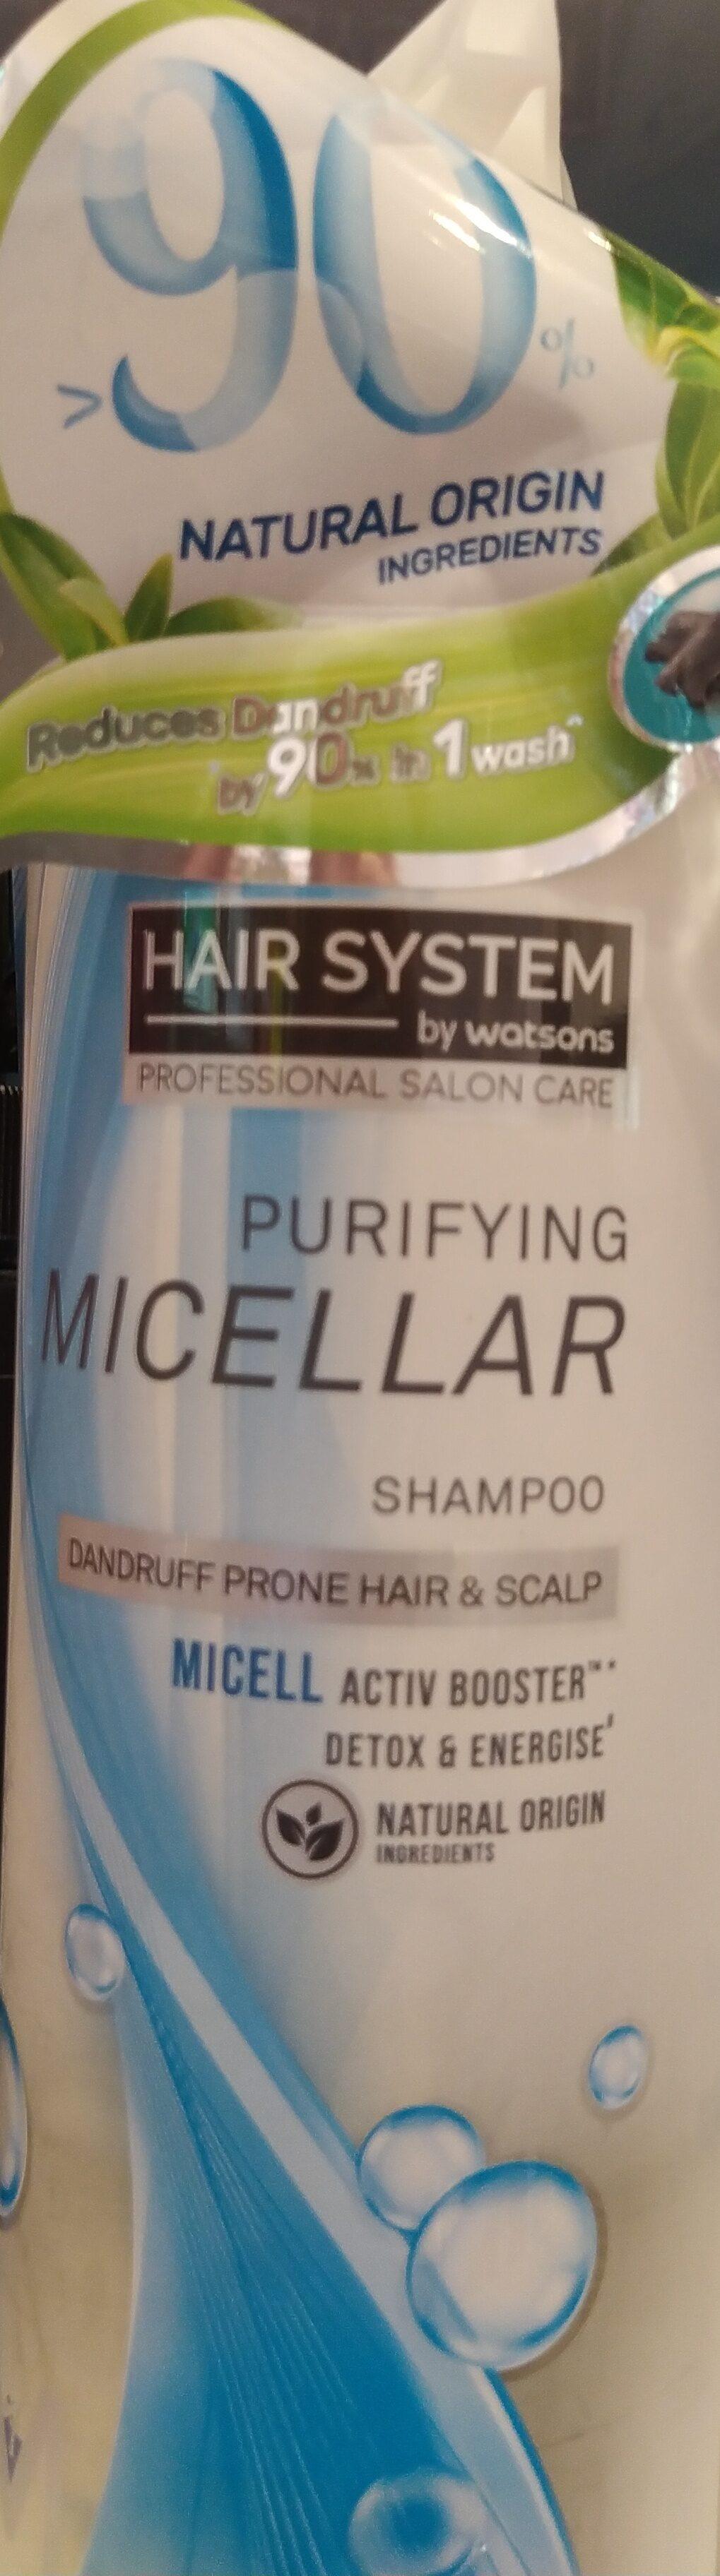 Micellar Botanical Purifying Shampoo - Product - en